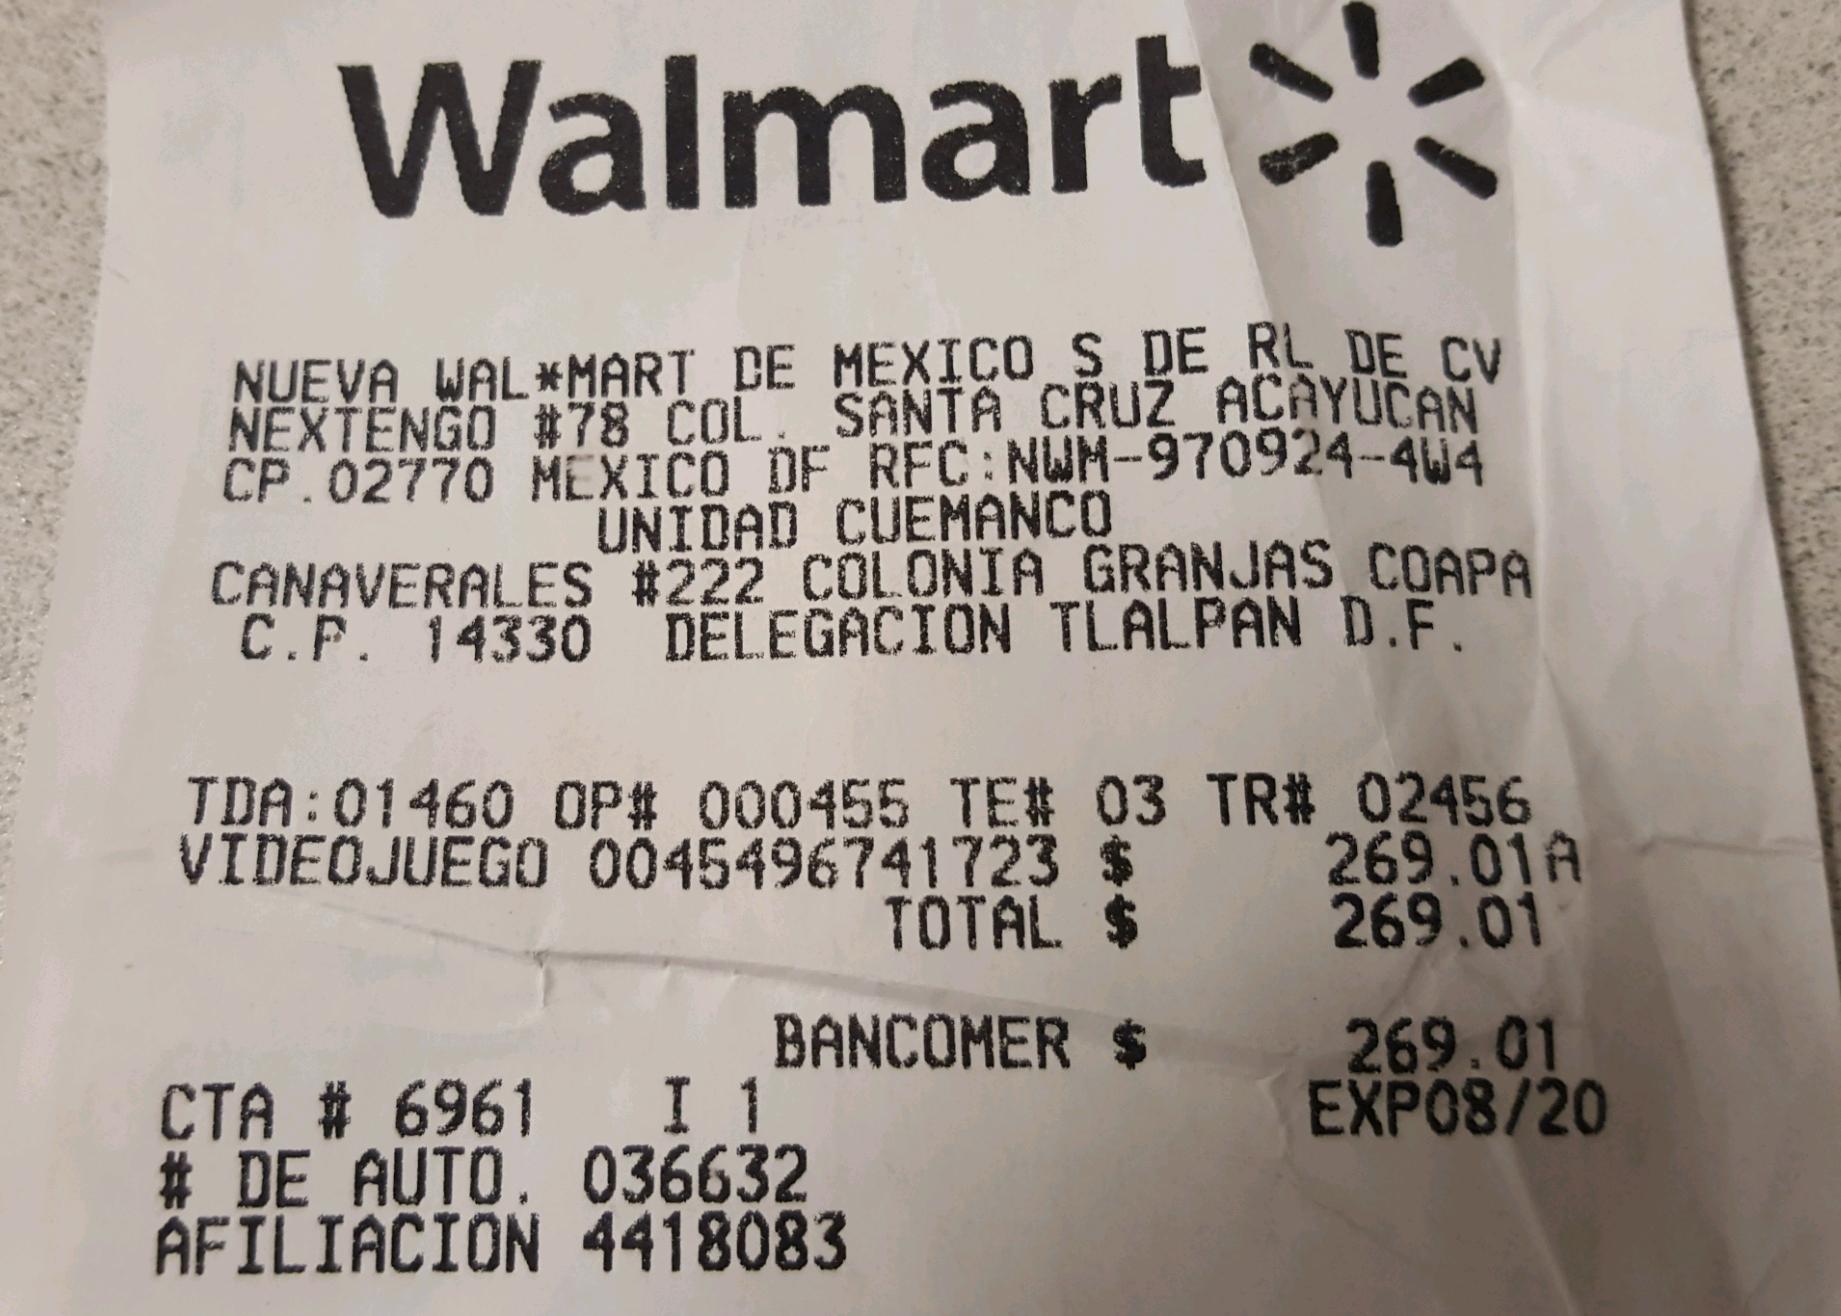 Walmart cuemanco: super mario 3D para 3DS a $269.01